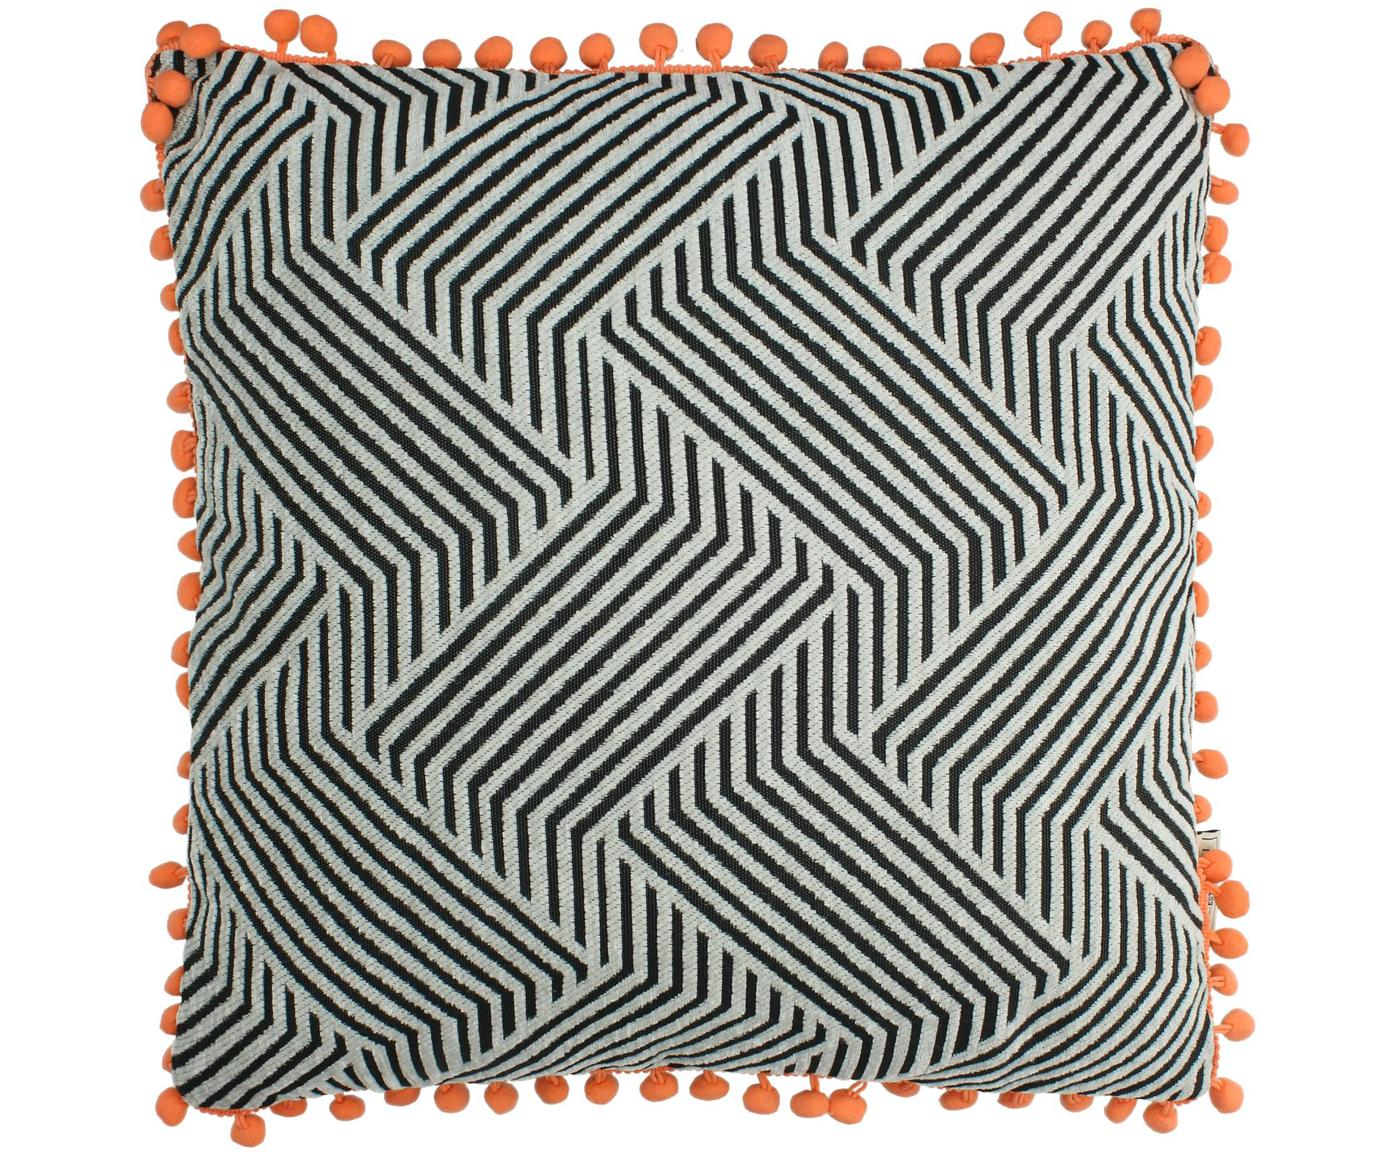 Cojín con pompones Waves, con relleno, Funda: poliéster, Negro, blanco crudo, naranja, An 45 x L 45 cm